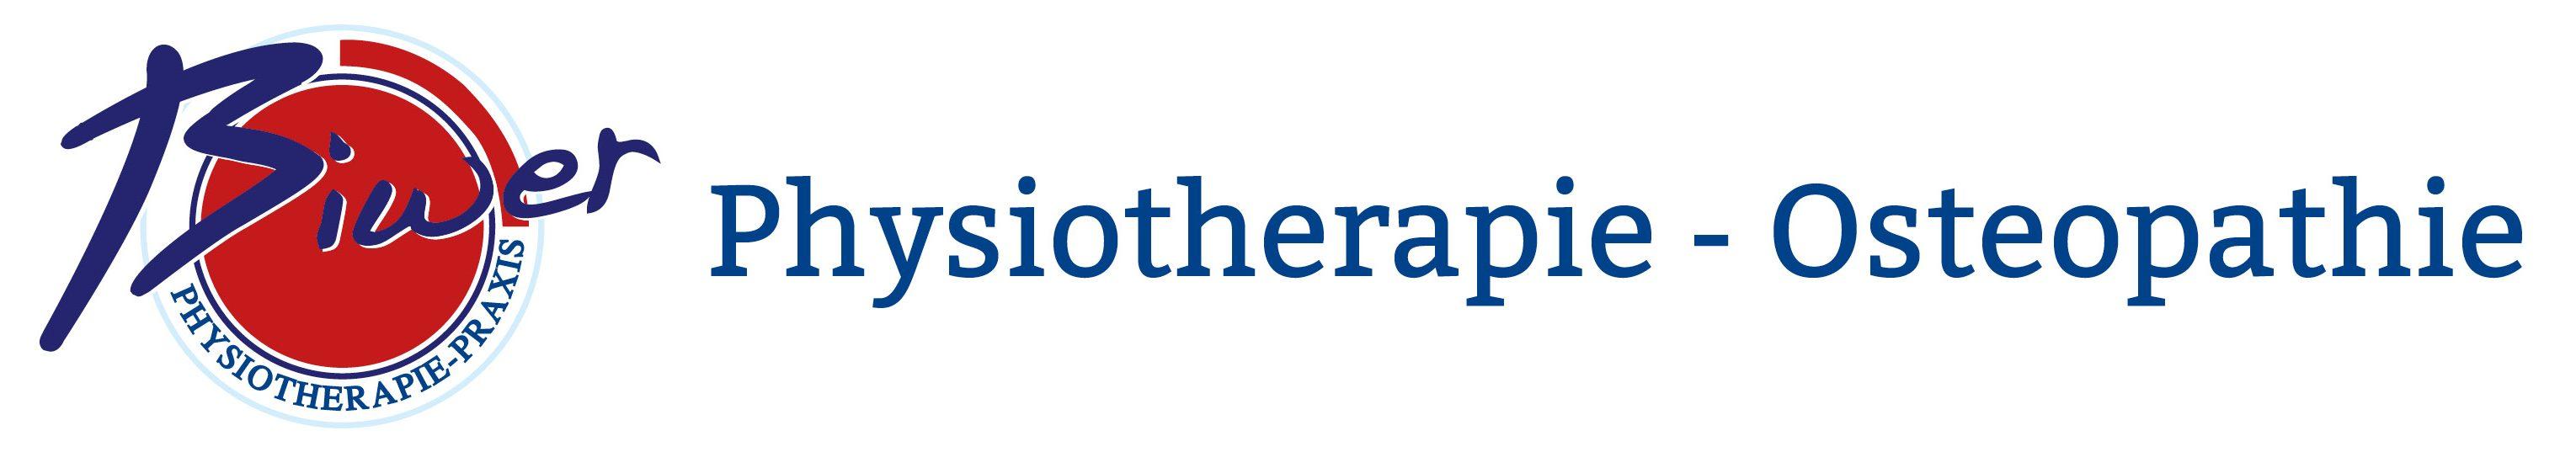 Physiotherapie Biwer